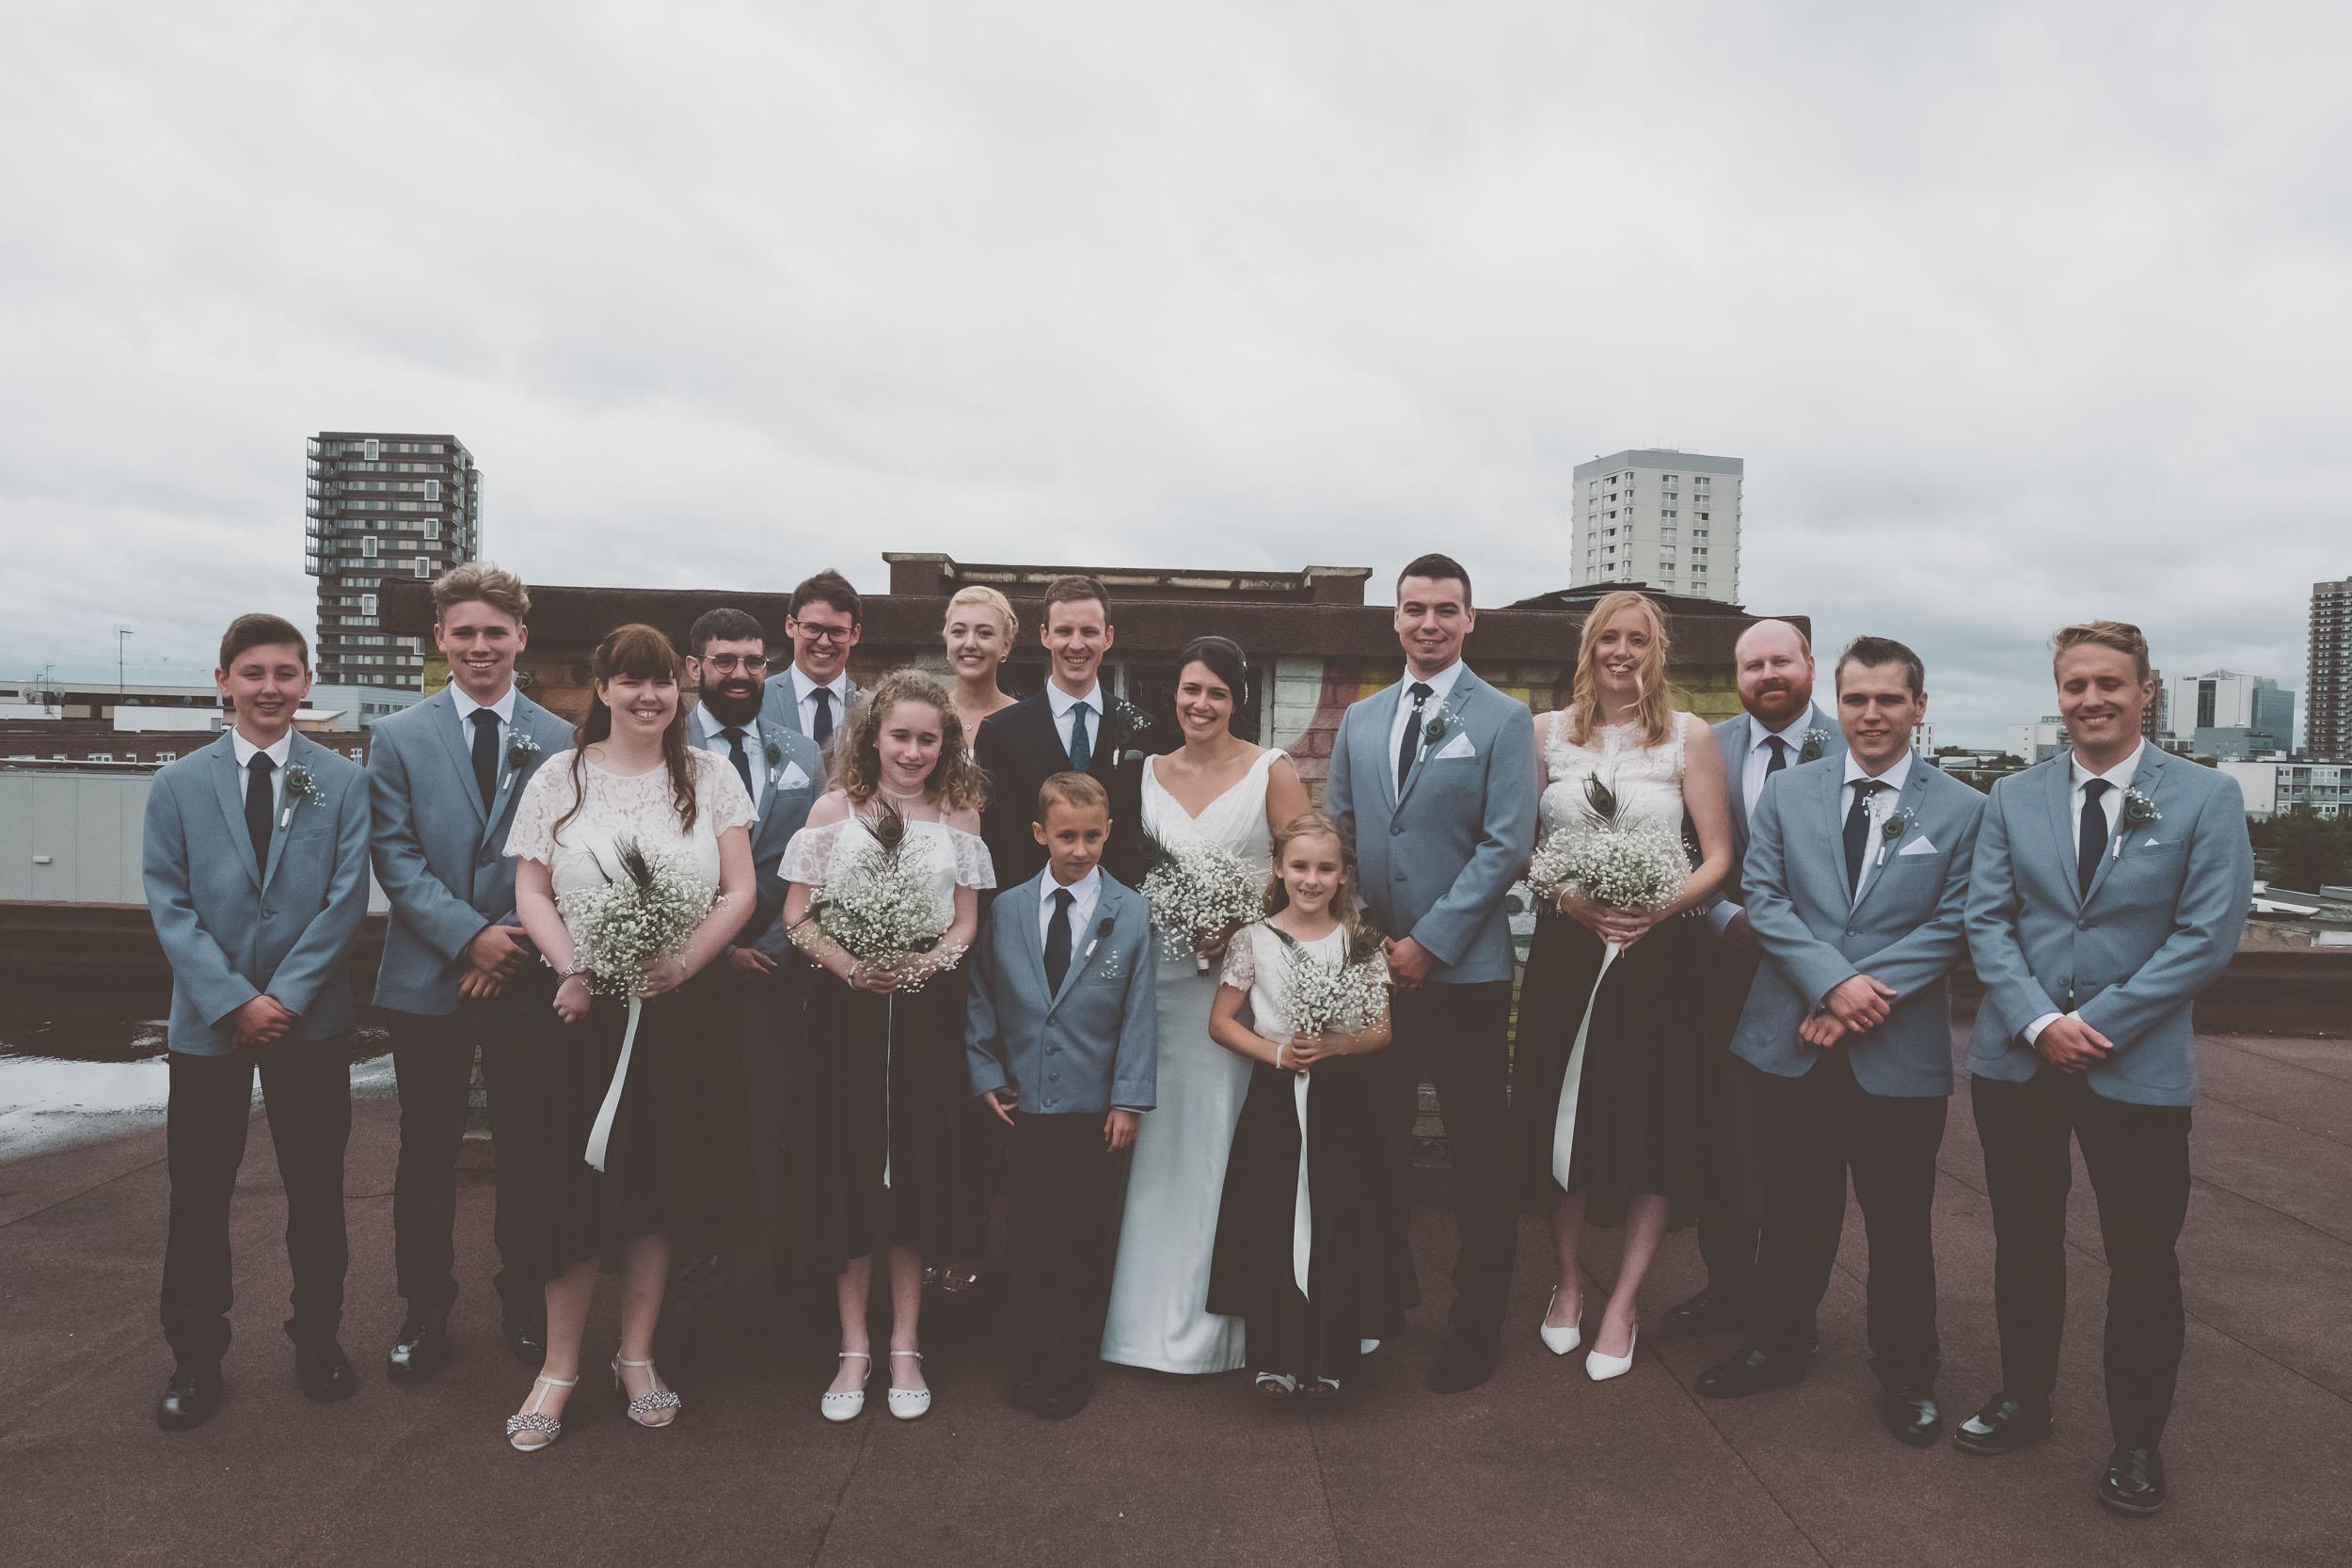 islington-town-hall-4th-floor-studios-wedding265.jpg